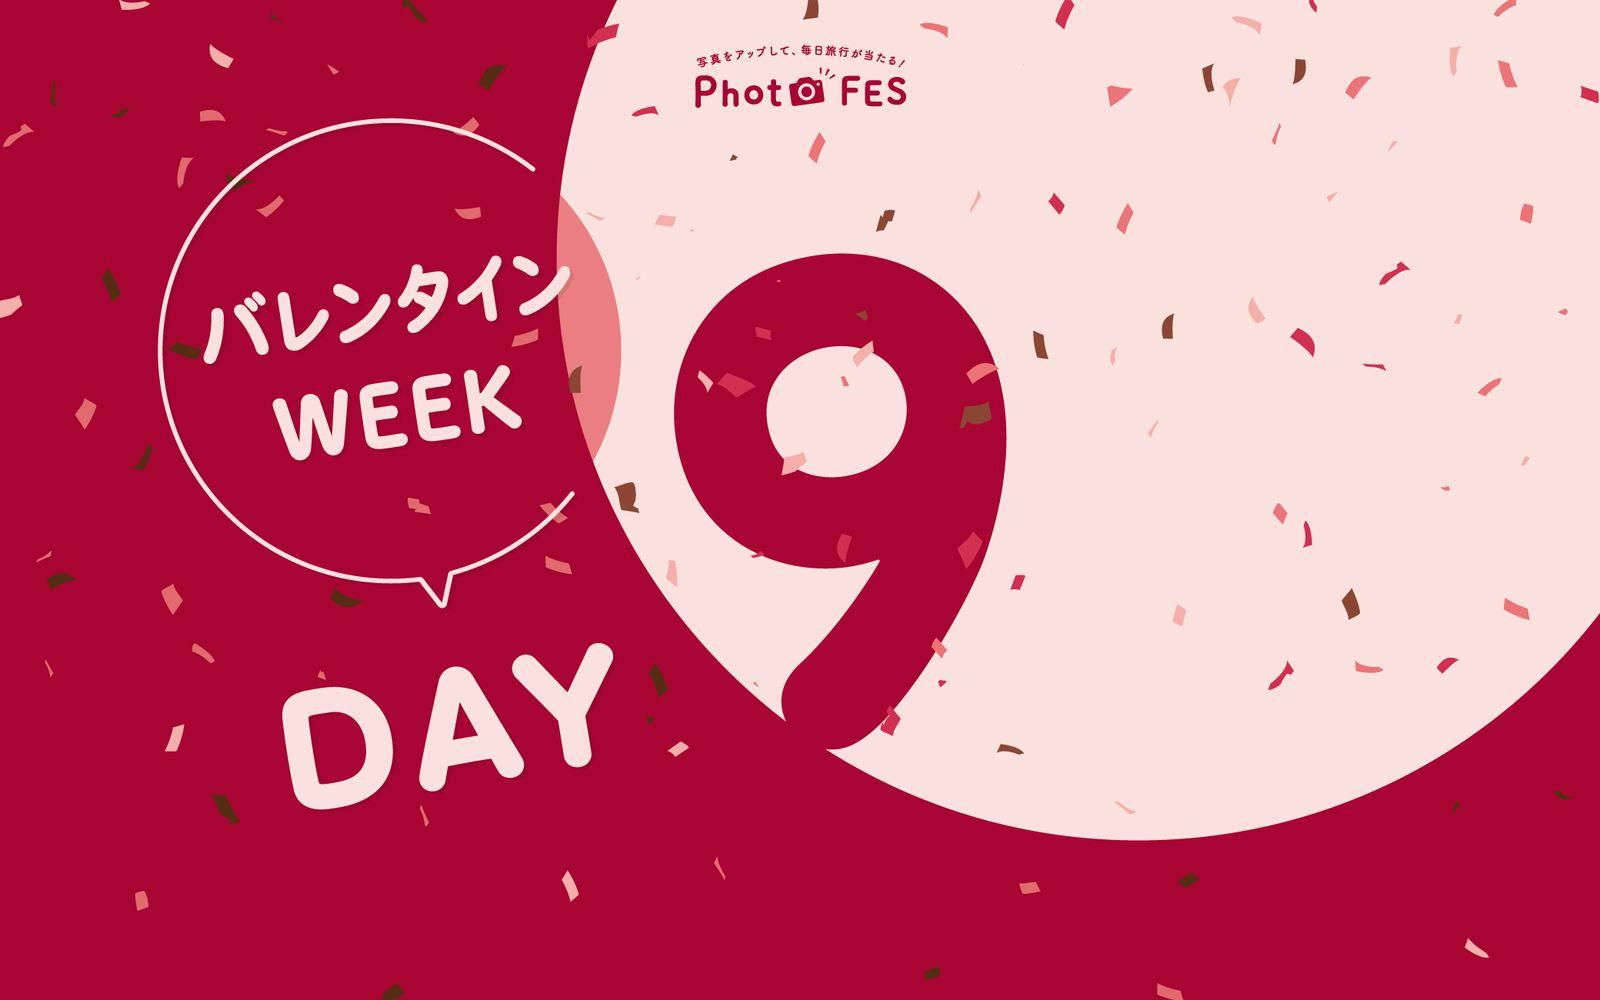 【DAY9】「Photo FES バレンタインWEEK」2月9日投稿分であたる賞品&受賞者発表